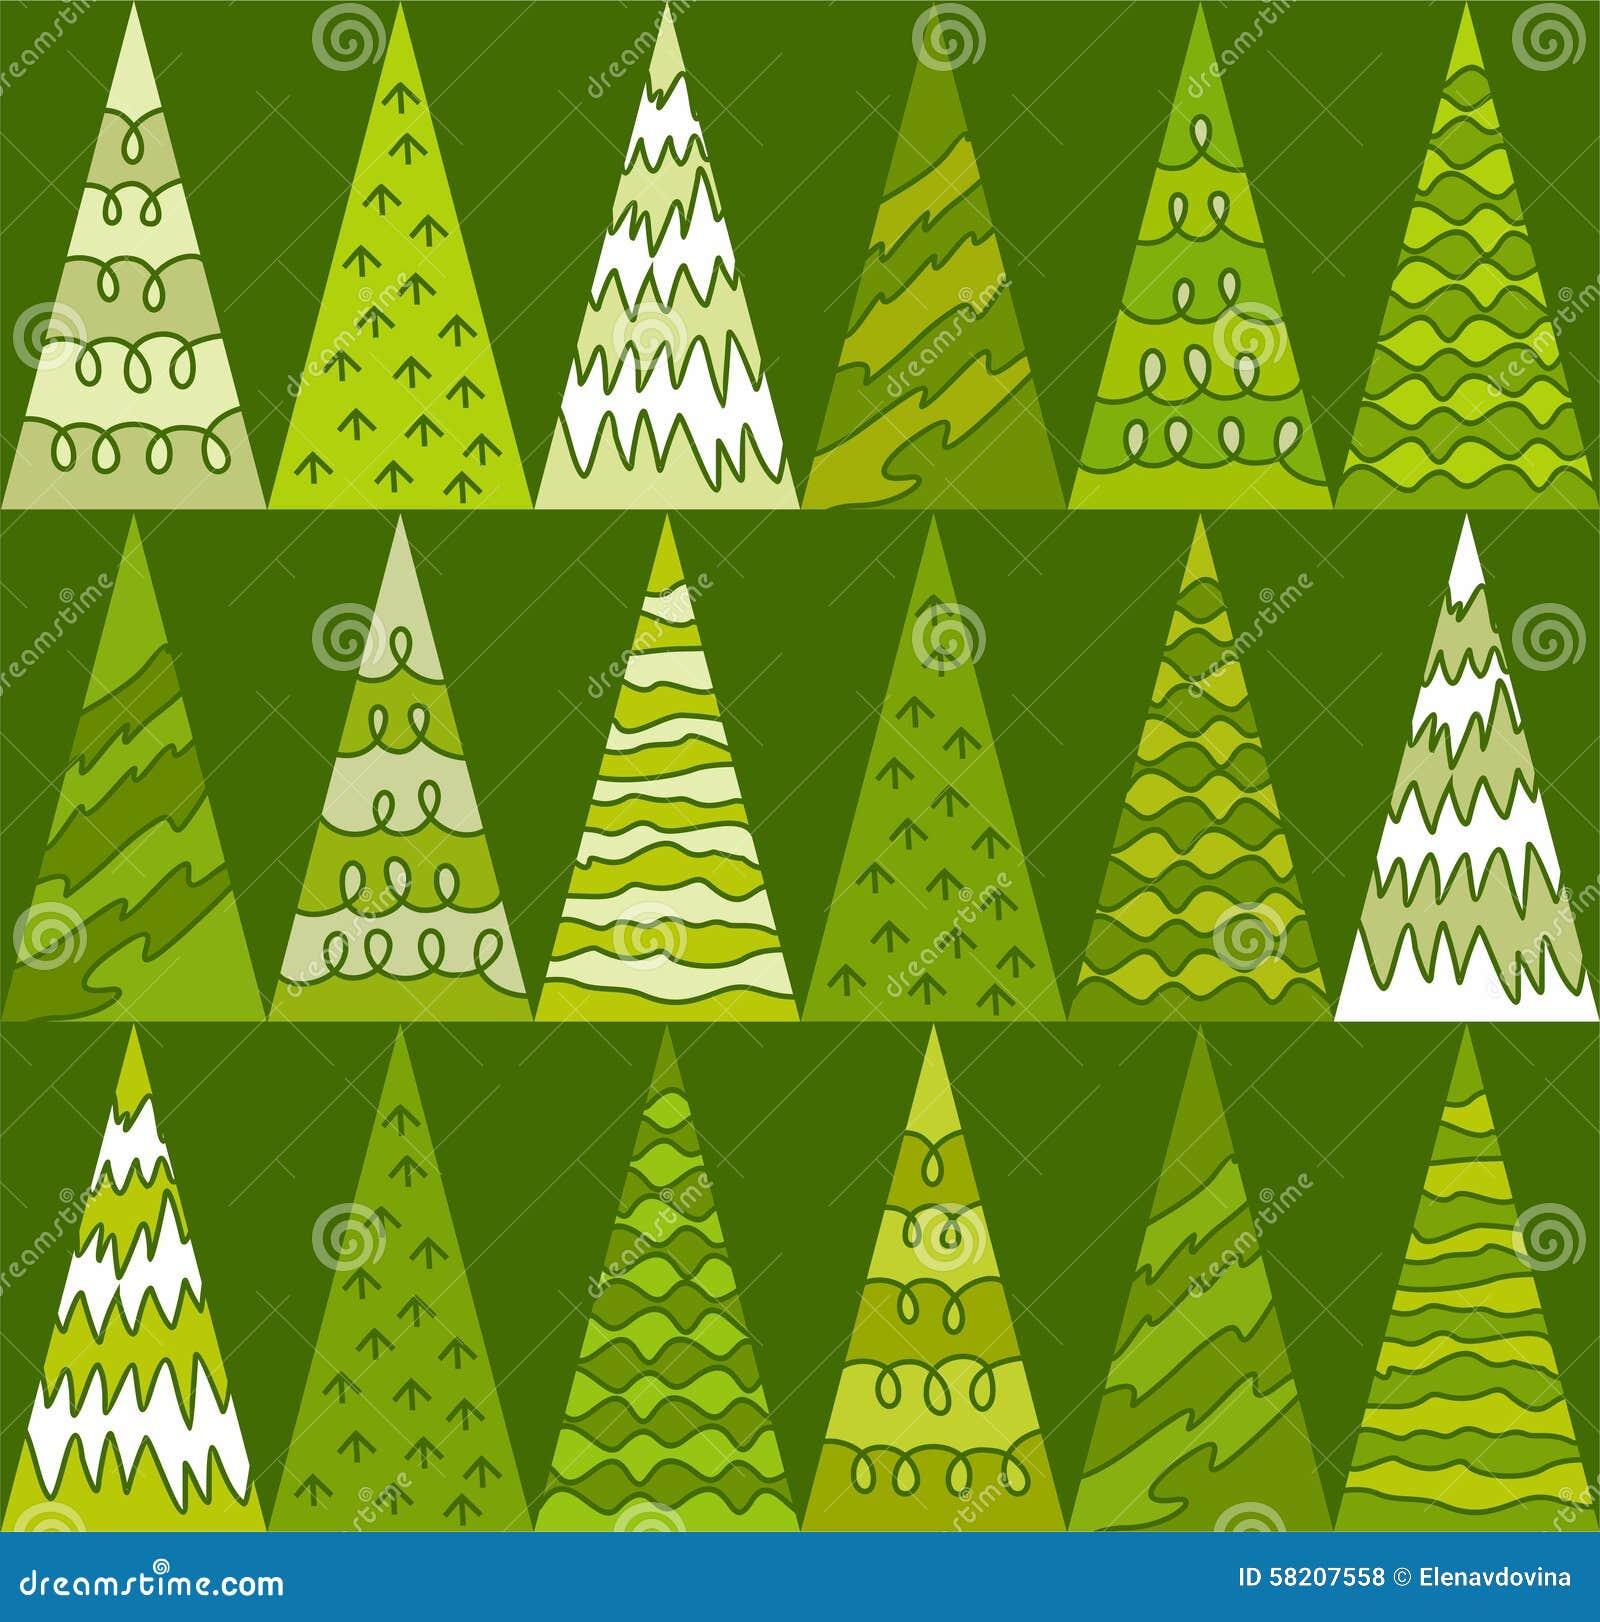 Sapin arbres vert no l triangles fond g om trique et vert sans couture illustration de - Dessin sapin vert ...